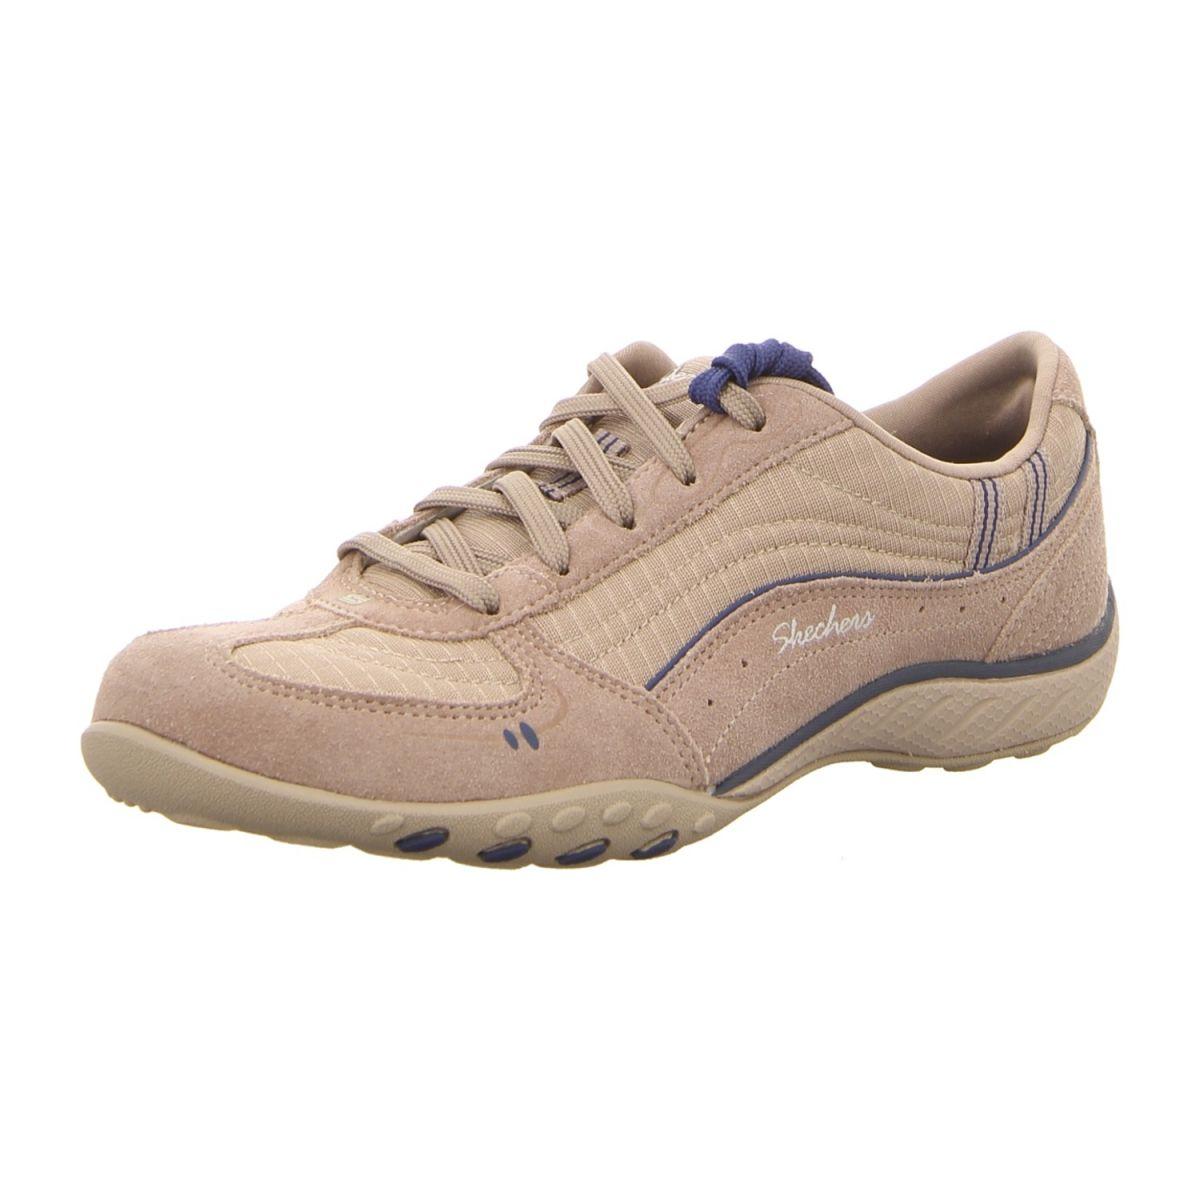 NEU: Skechers Sneaker Breathe Easy JustRe 22459 STNV